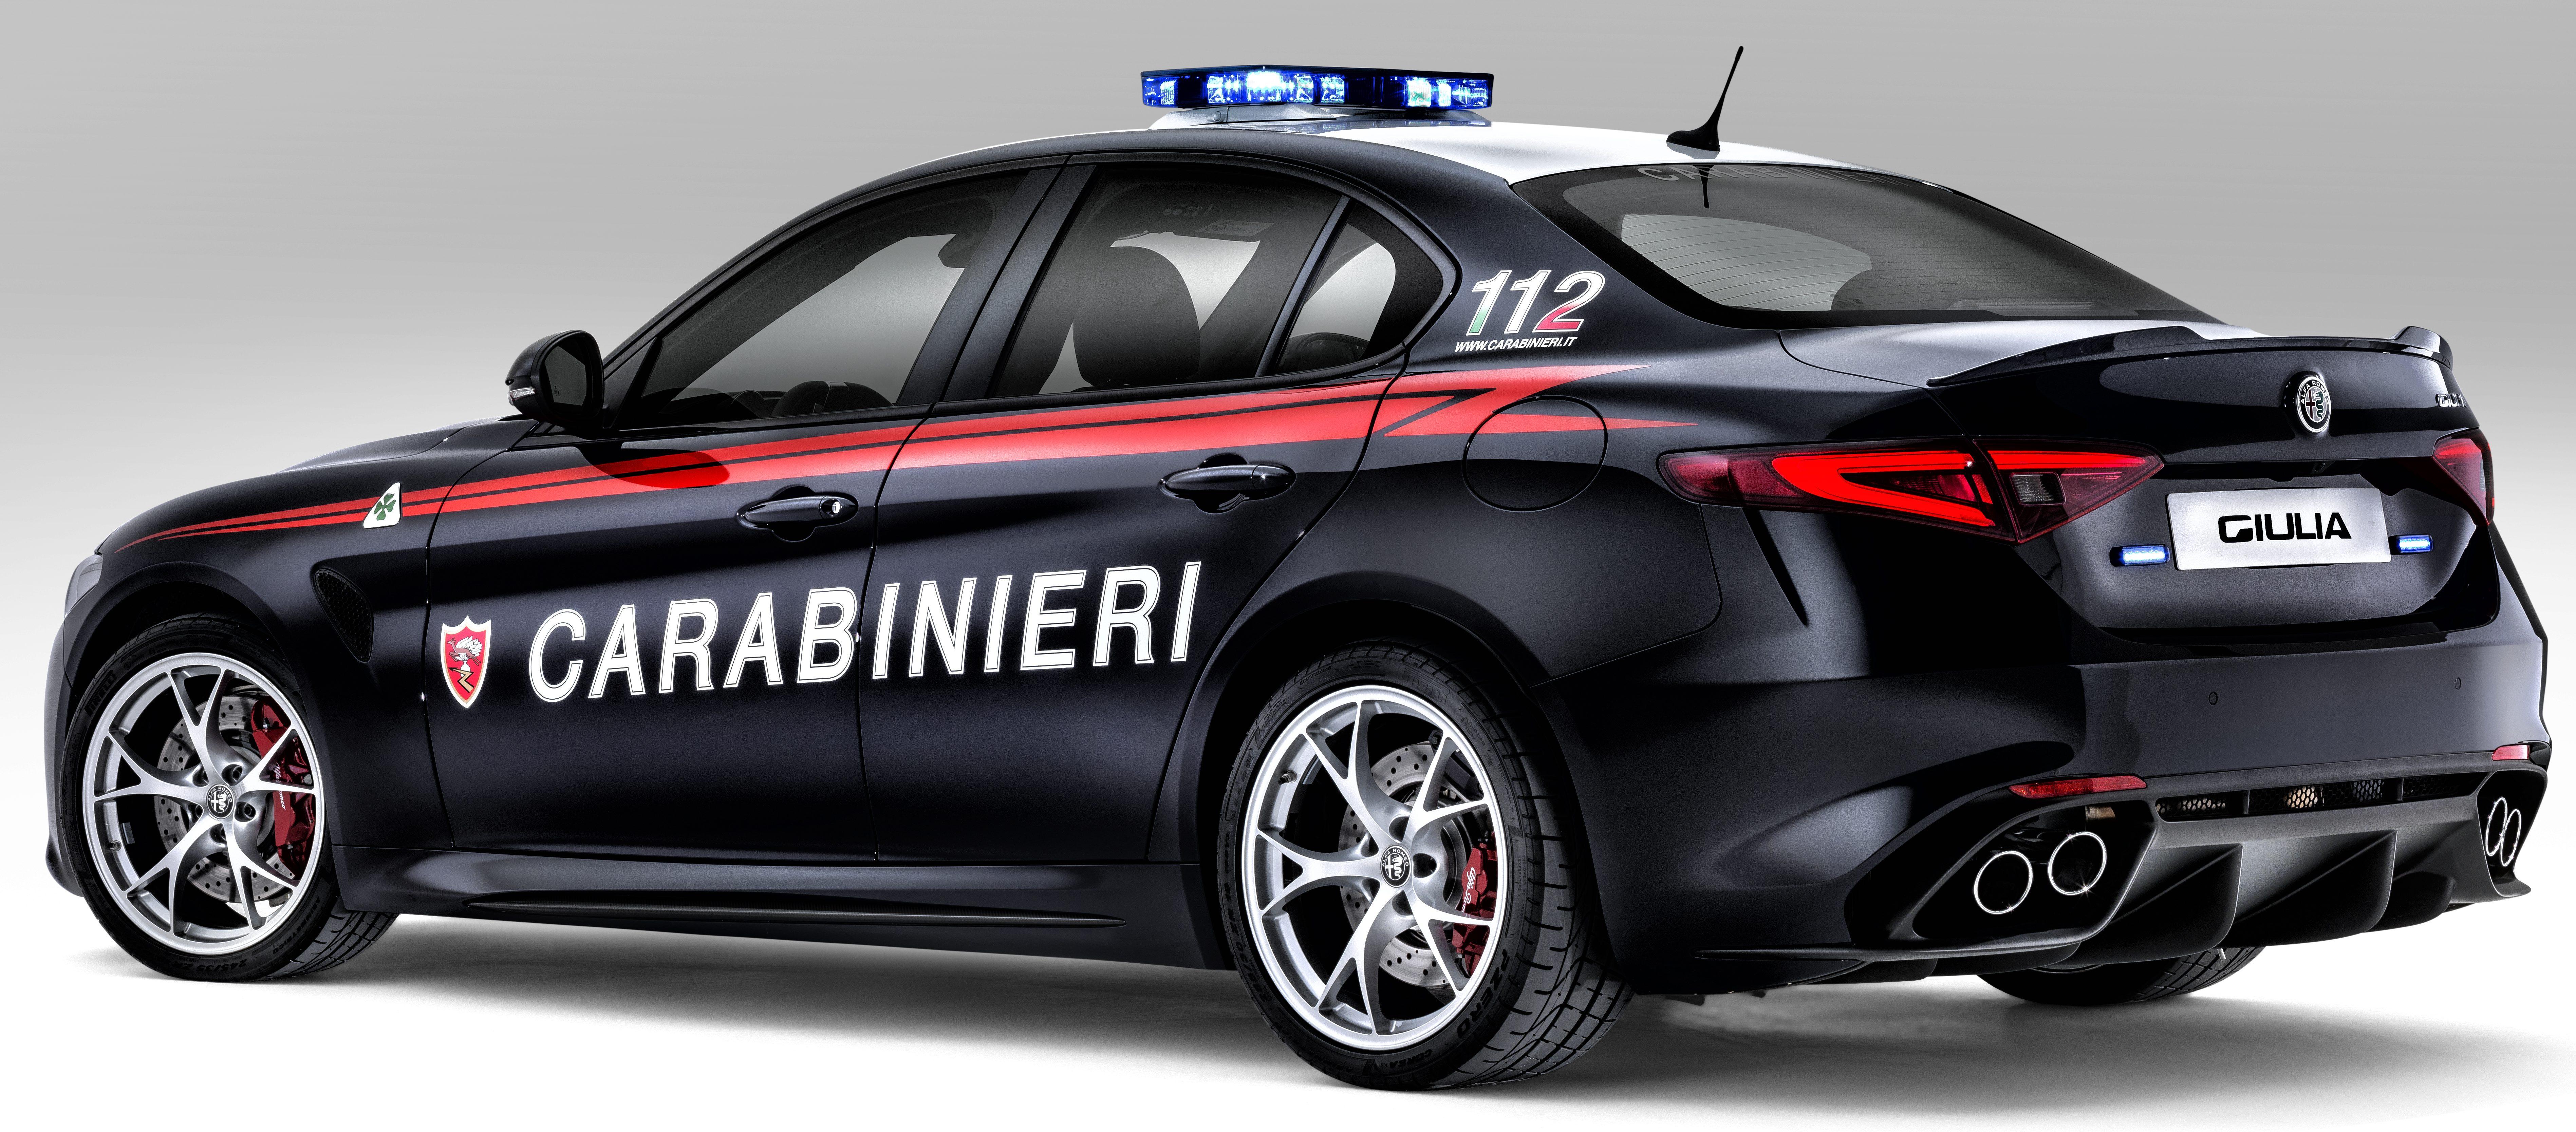 Alfa Romeo Giulia Quadrifoglio joins Italian Carabinieri ...